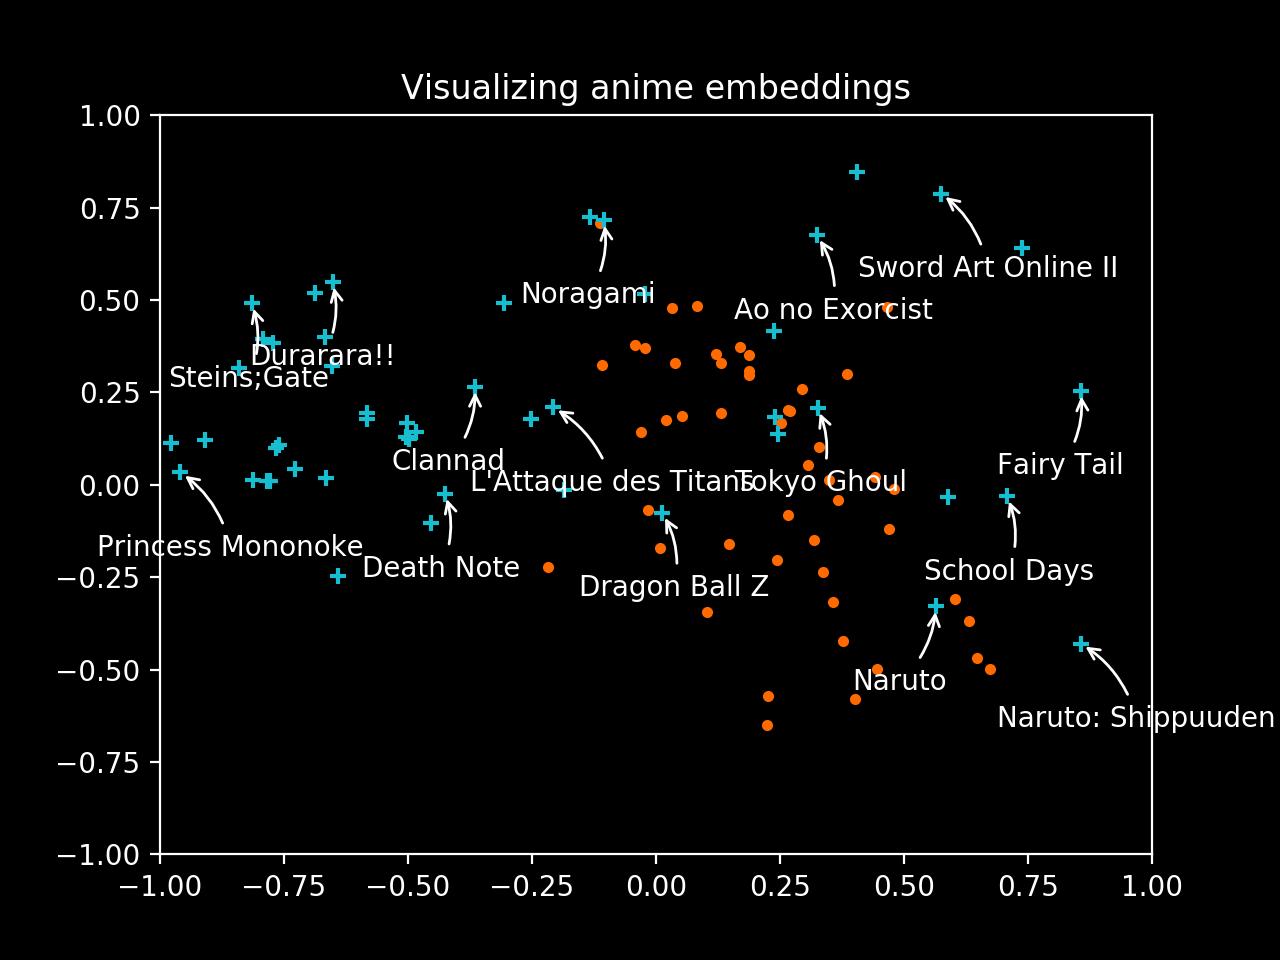 Visualize anime embeddings